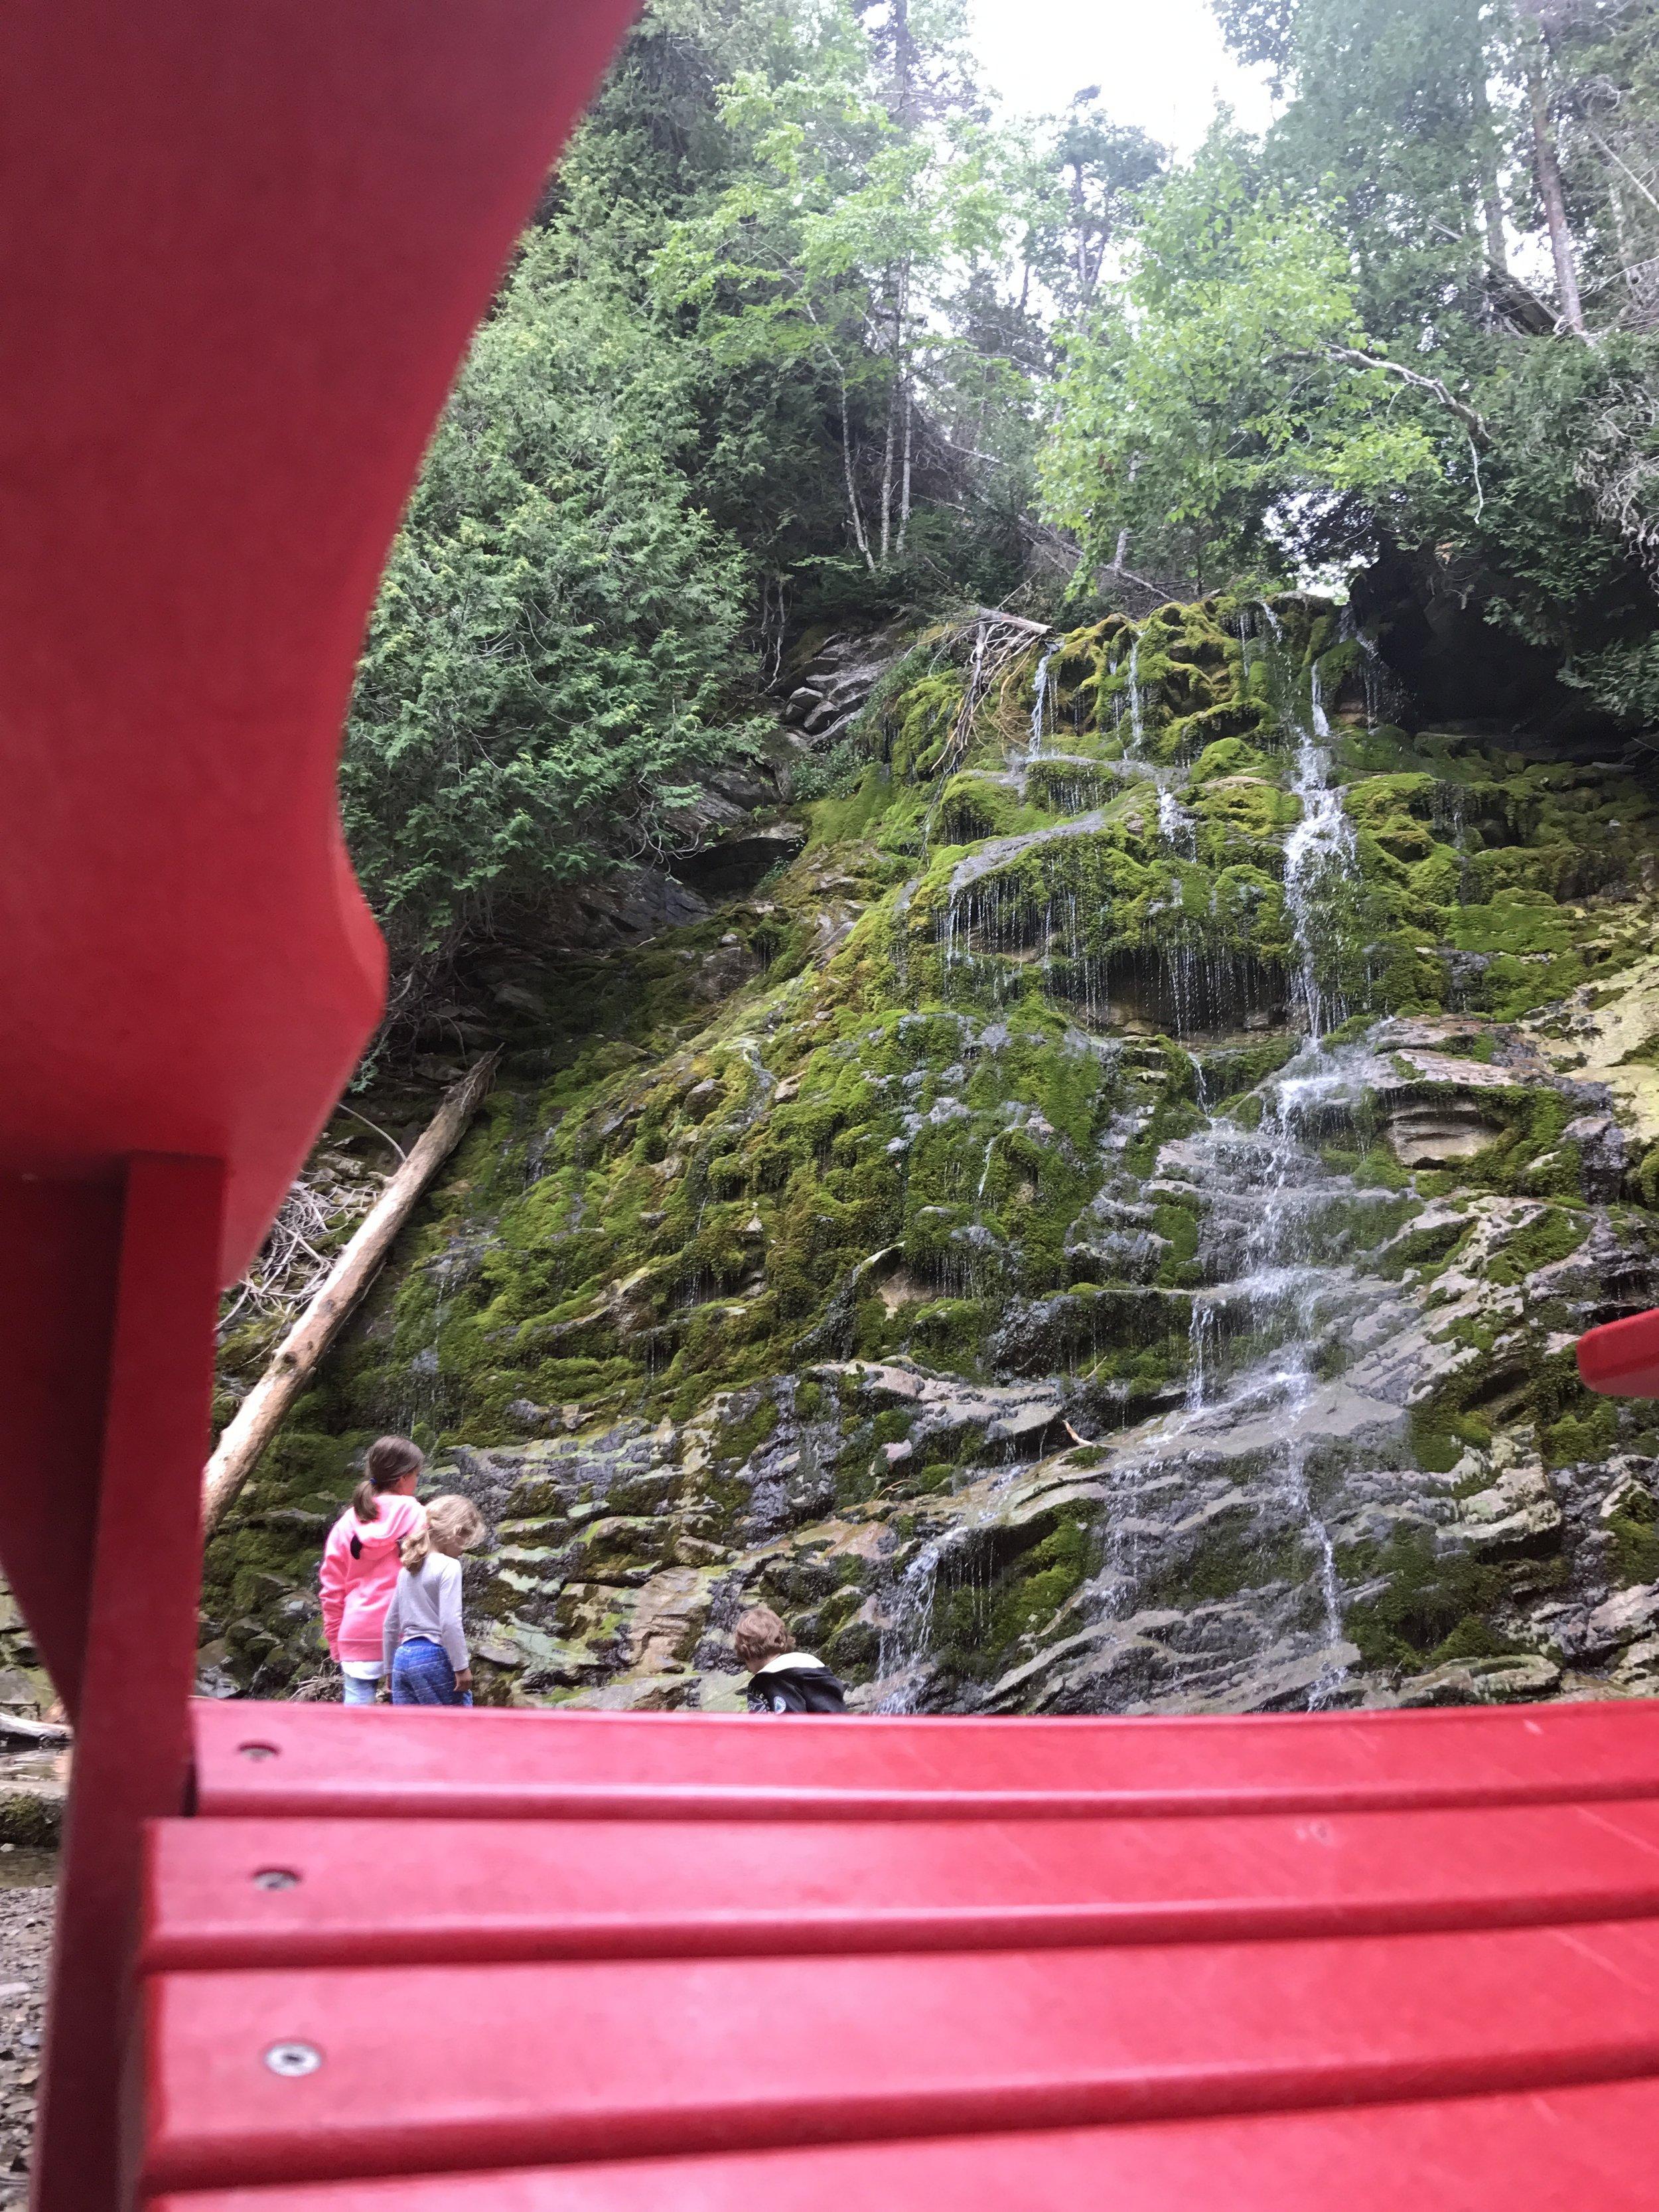 #sharethechair on the Chute (Waterfall) Trail.